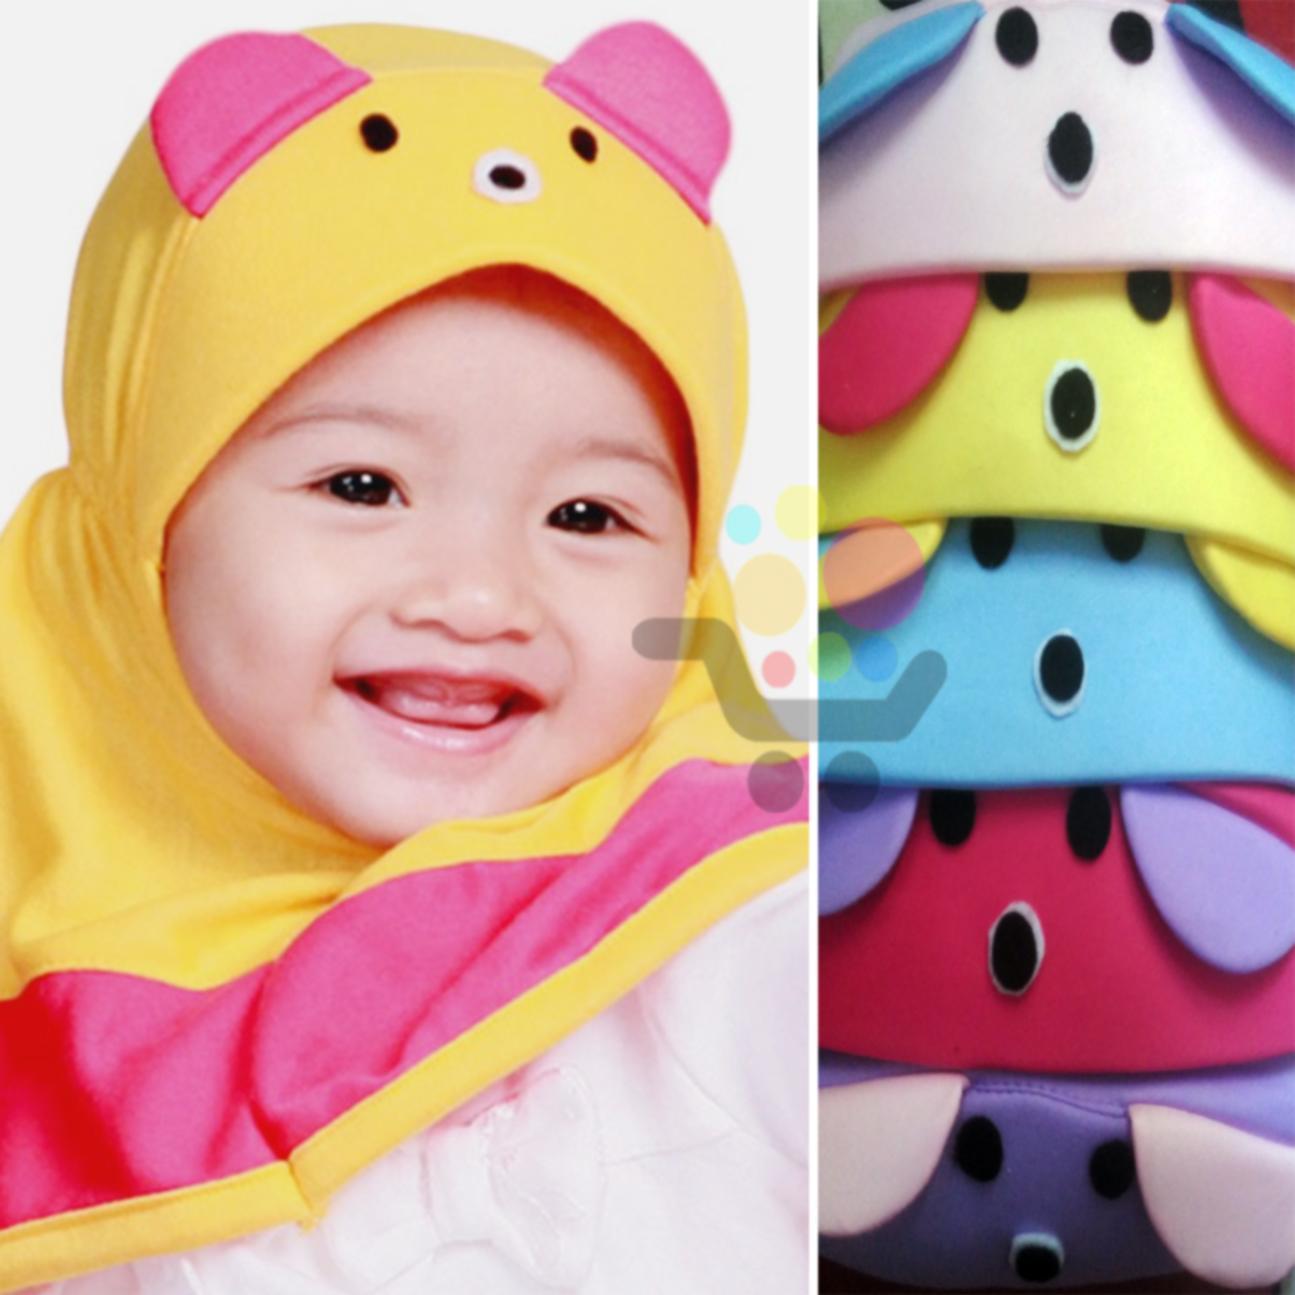 Fitur Permata Jilbab Bayi 01 Size L Biru Dan Harga Terbaru Info